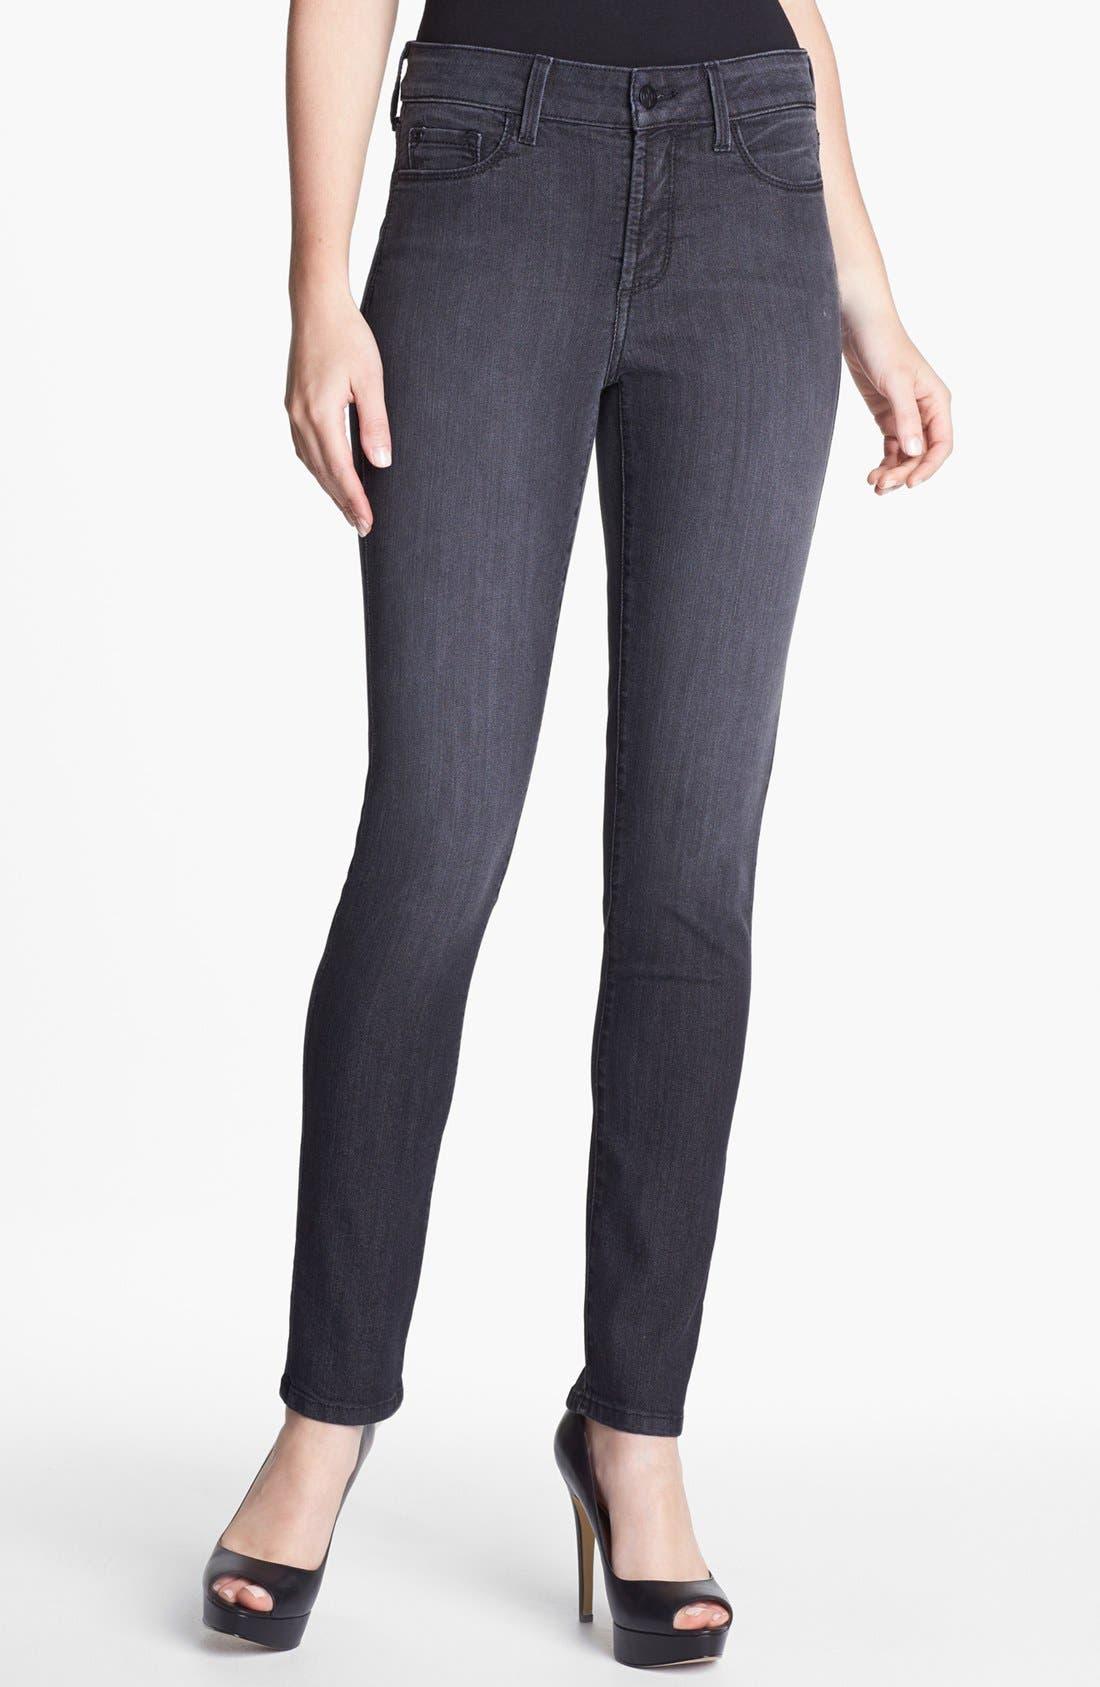 Alternate Image 1 Selected - NYDJ 'Alina' Stretch Skinny Jeans